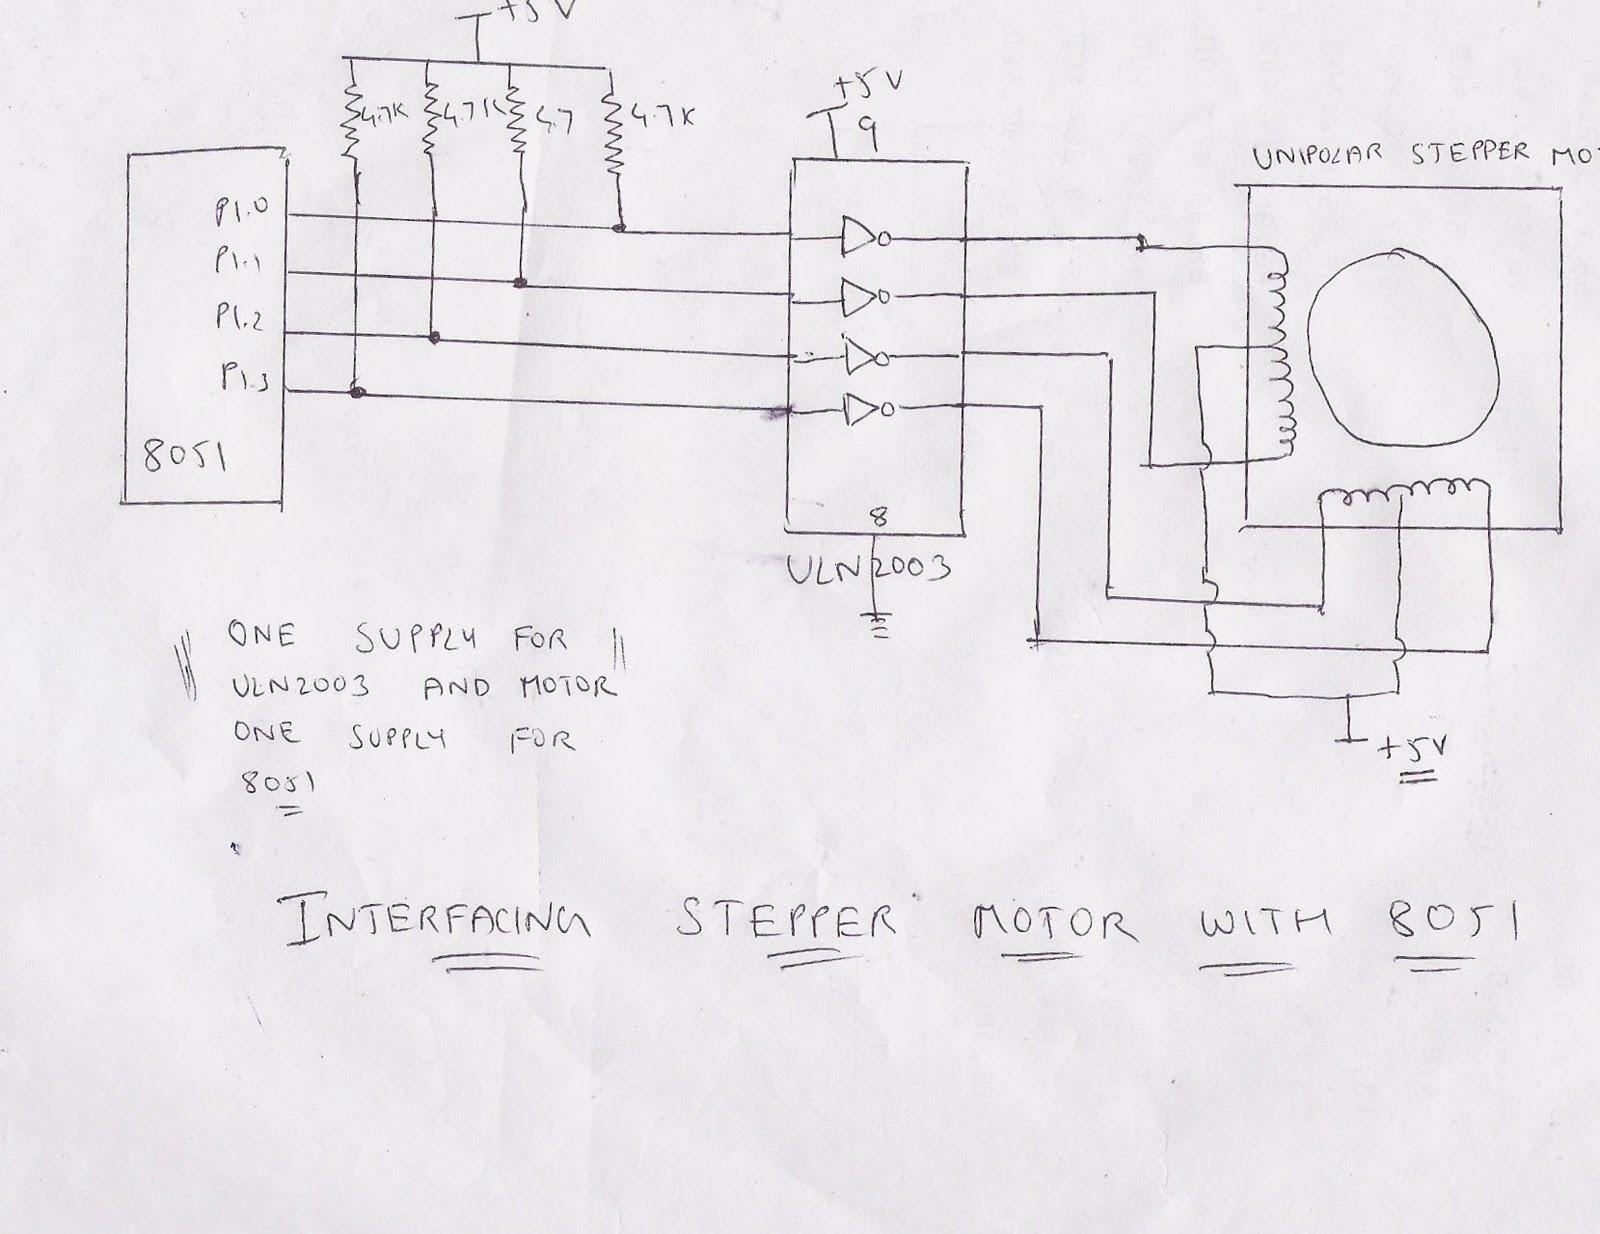 Servo Motor 8051 Block Diagram Wiring Libraries Black Box Using 8051block And Explanation Of Each Blocks Microprocessor Microcontroller Interfacing With Stepper Motor8051